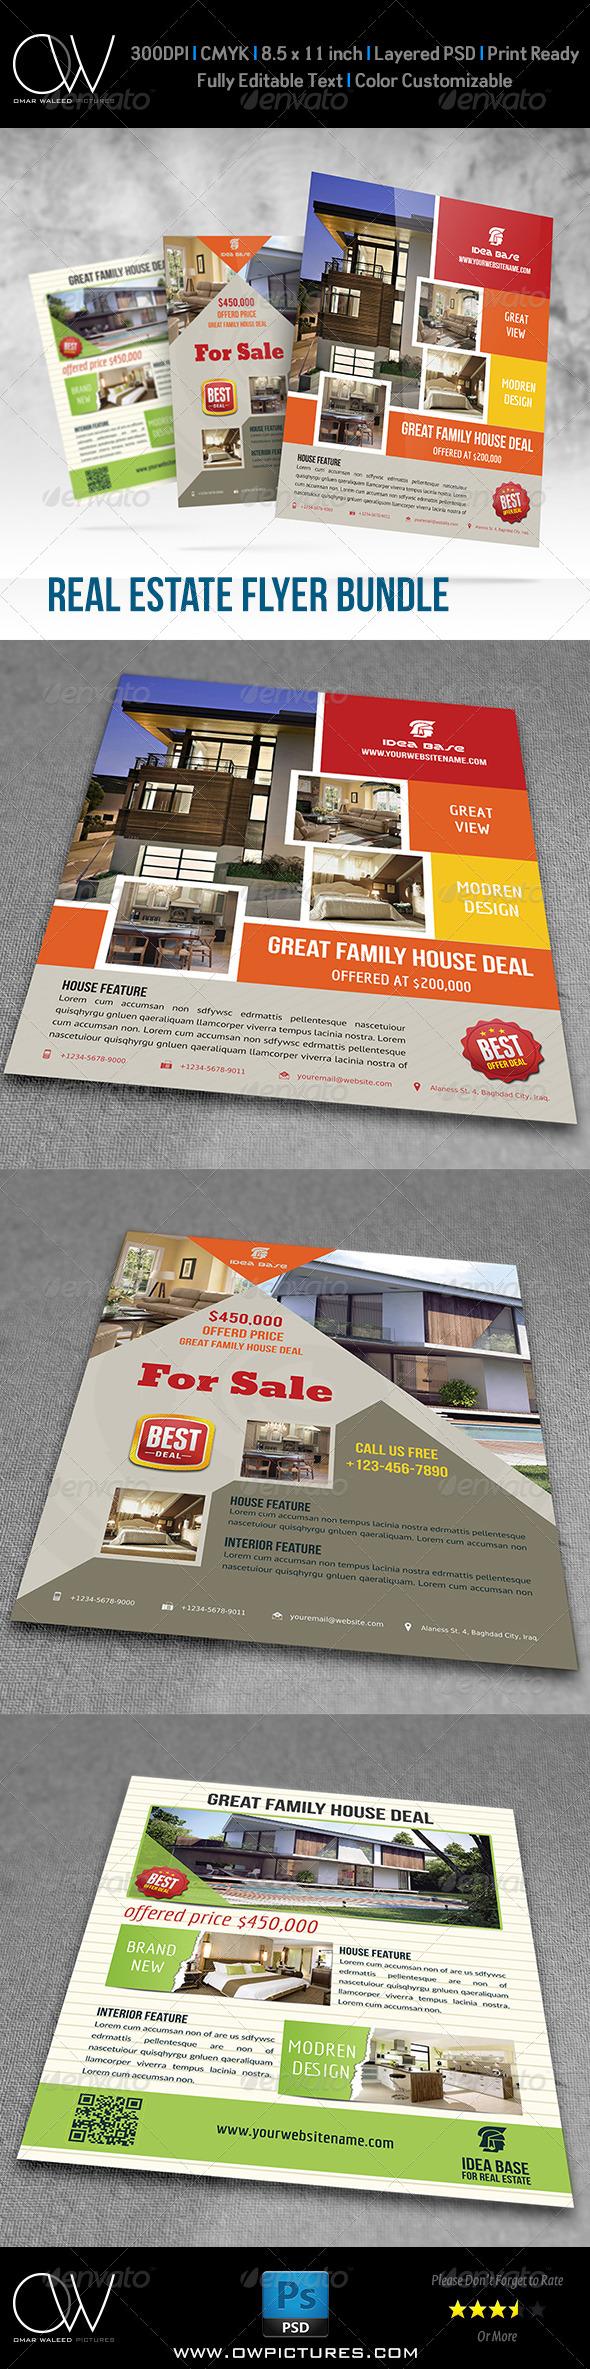 GraphicRiver Real Estate Flyer Bundle Template Vol.2 7905656